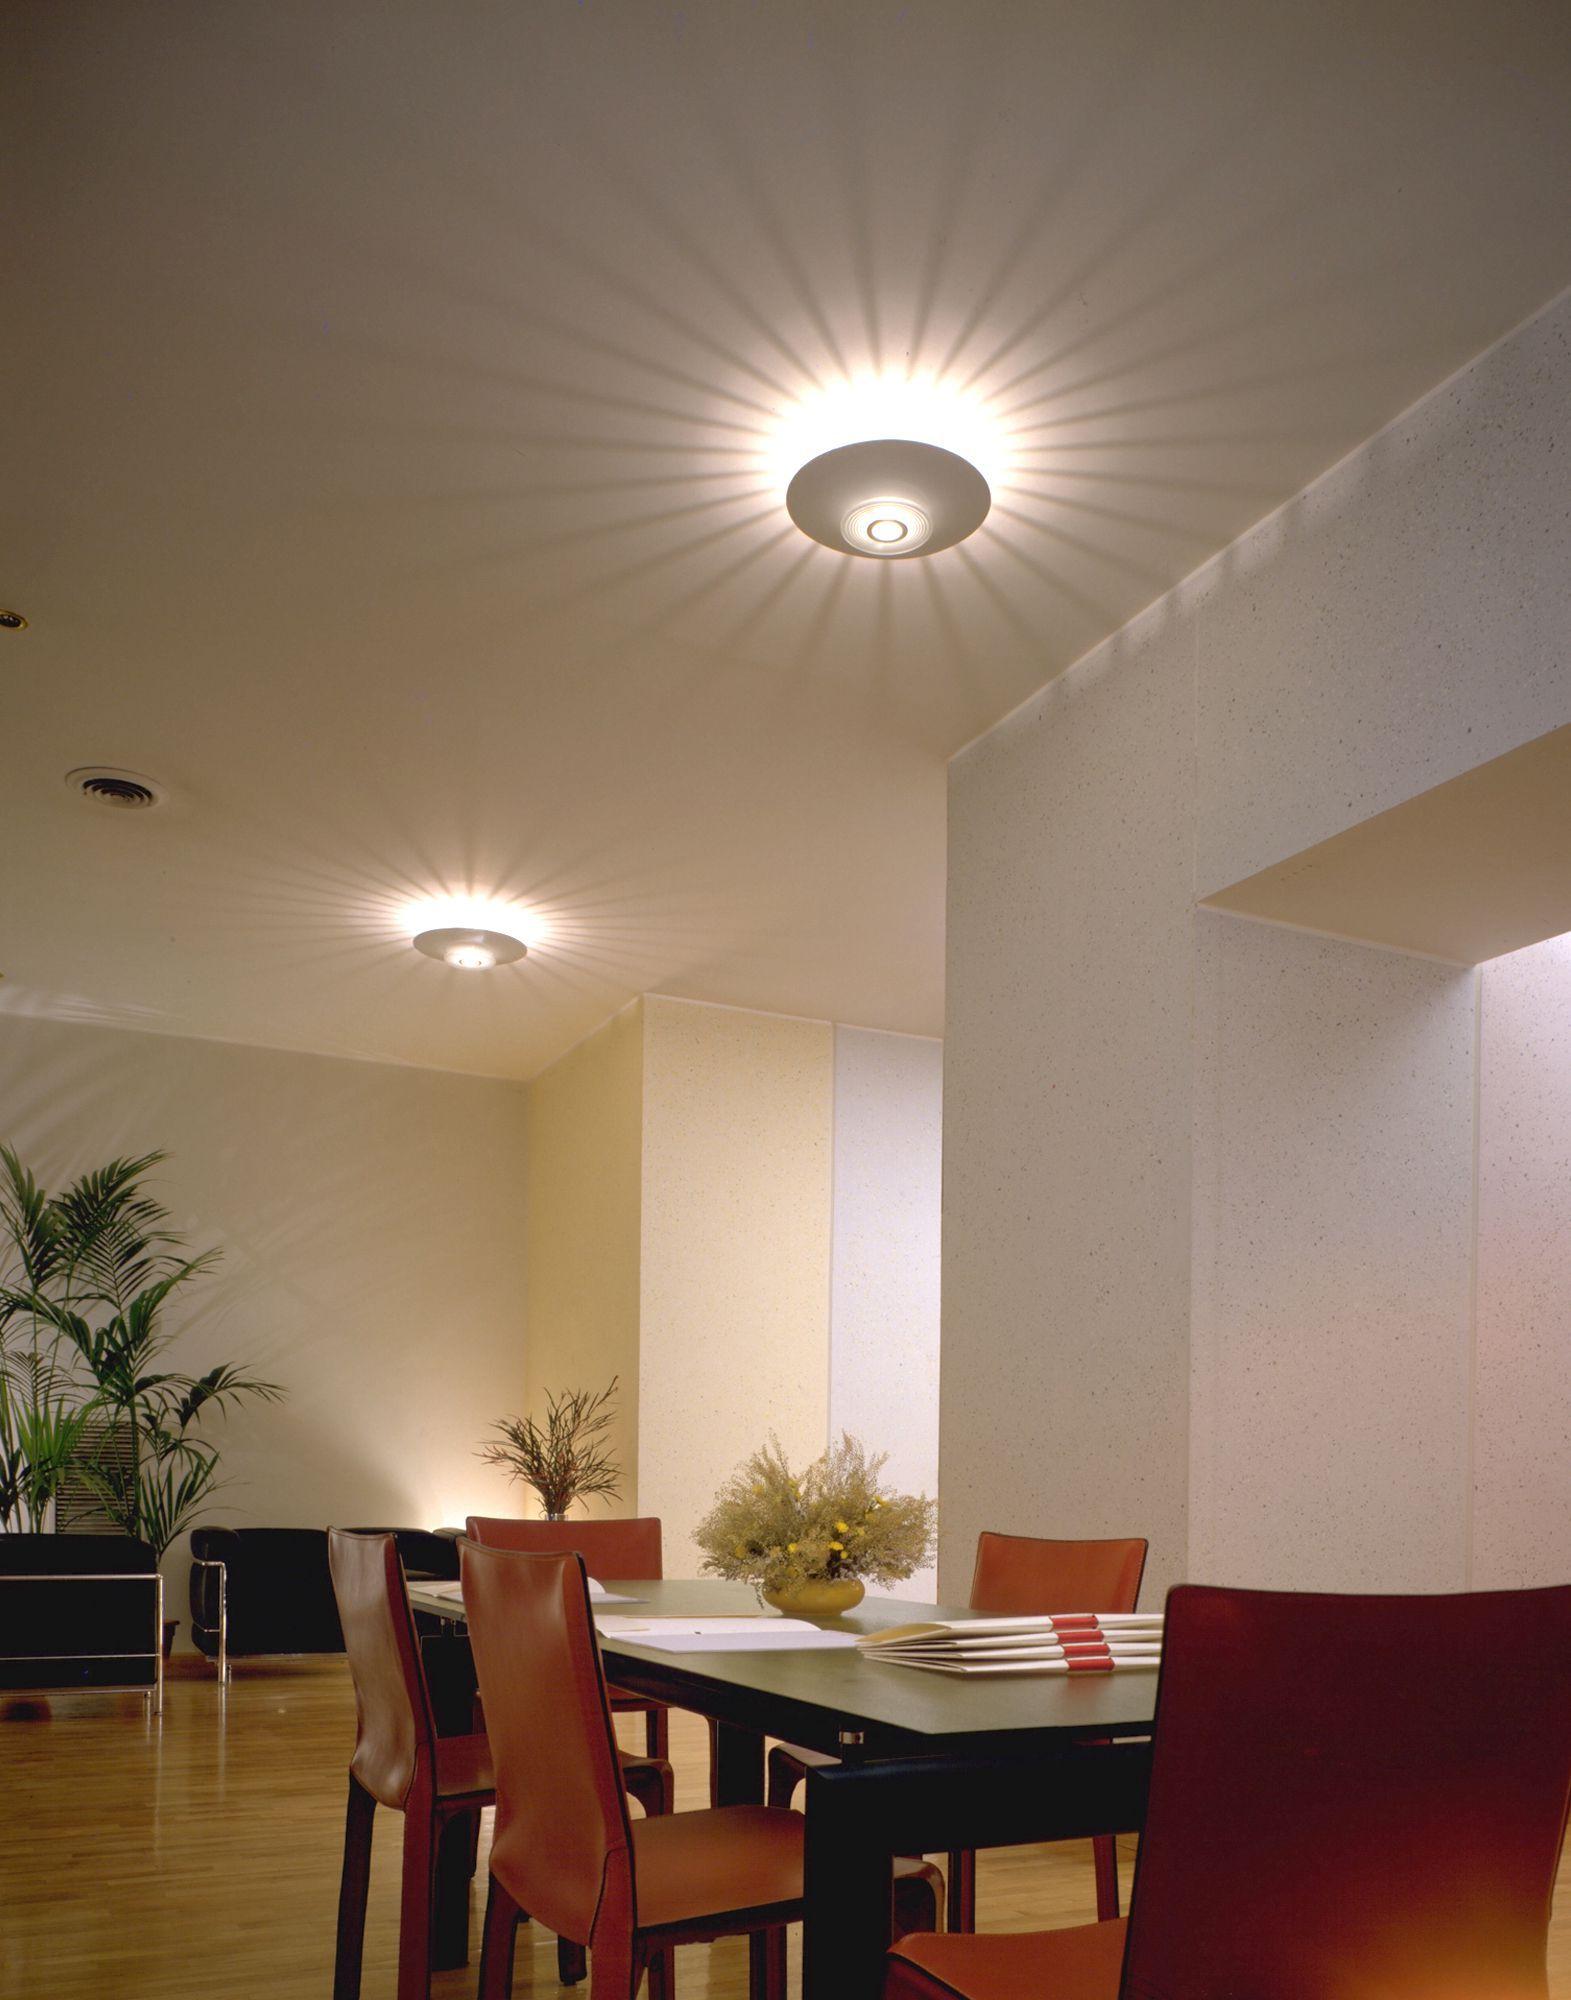 FLOS Lampada da parete Illuminazione Lampade da parete